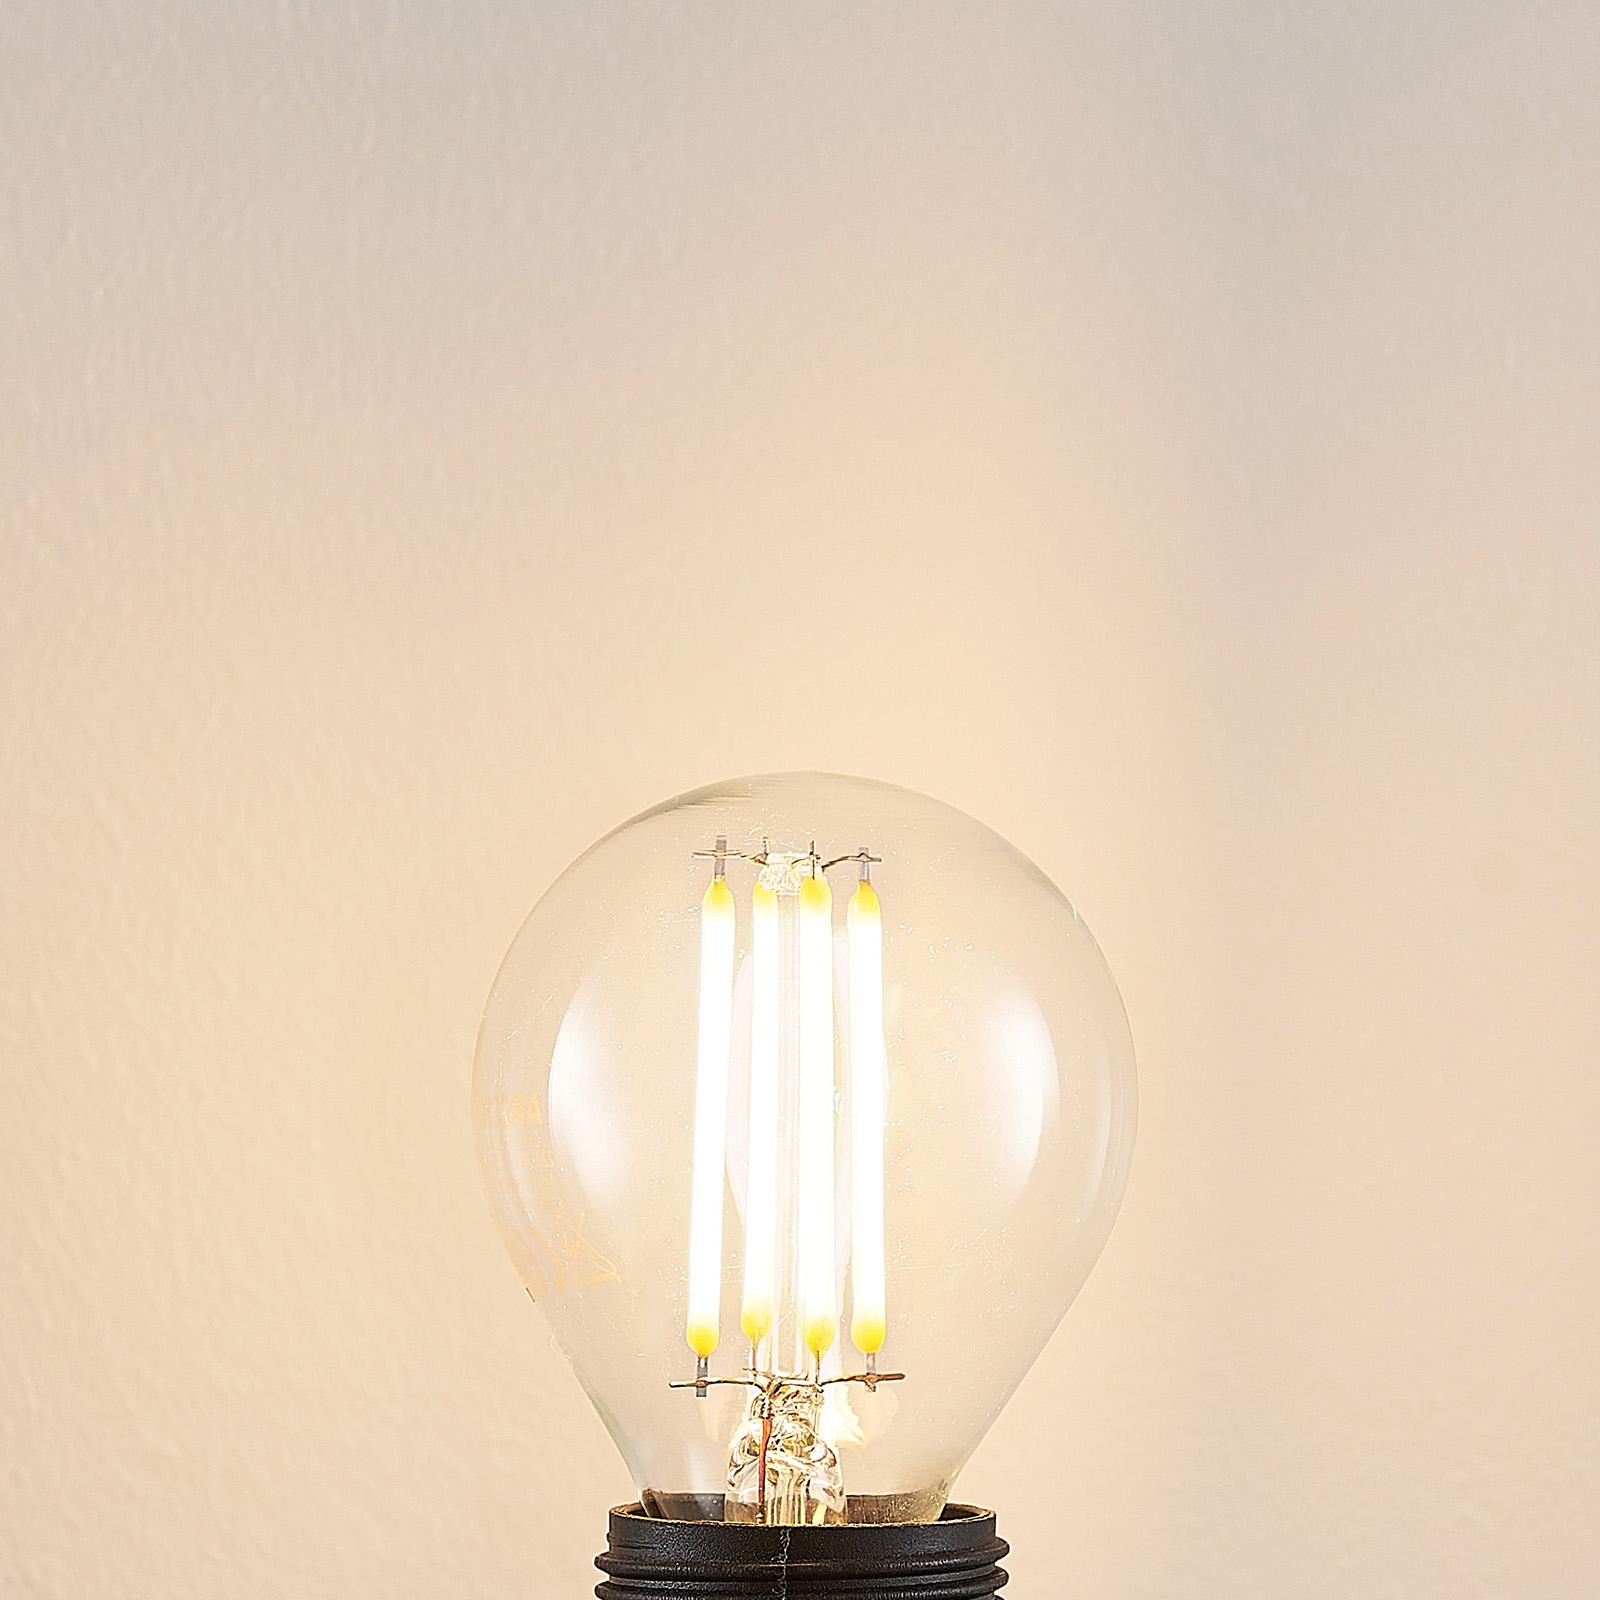 E14 LED-pære P45 4W 2,700K klar, dæmper med 3 trin